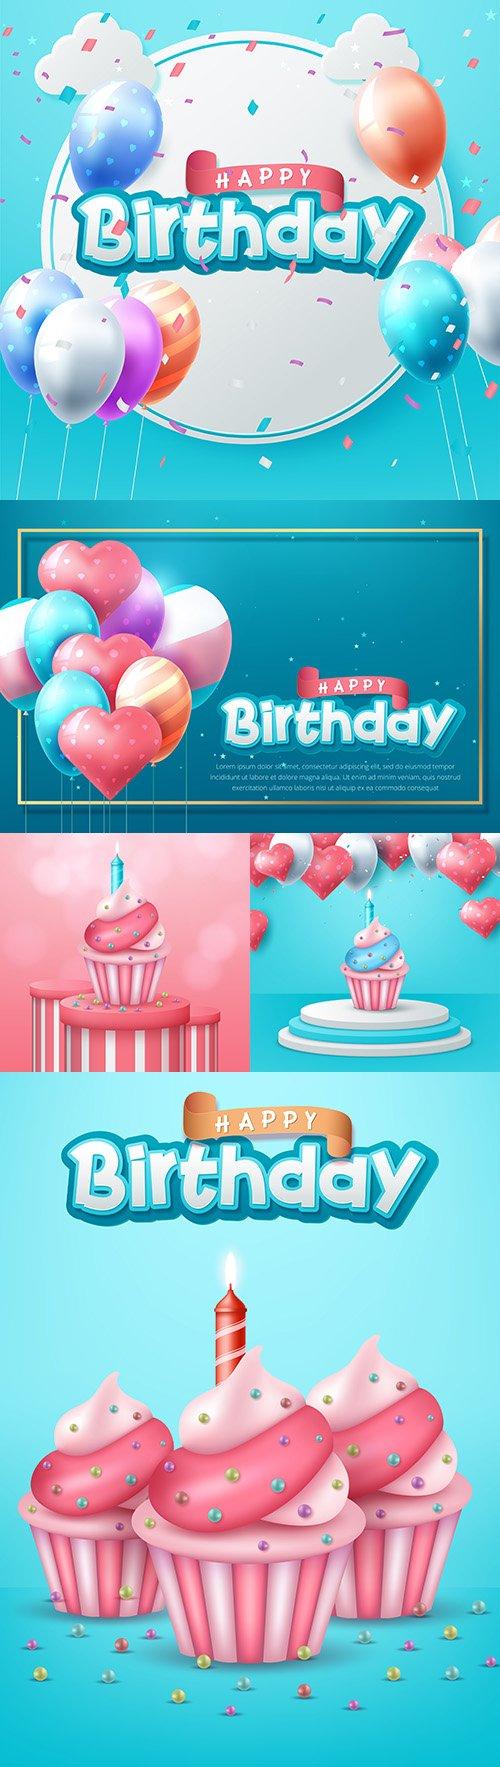 Happy birthday invitation realistic balloons and cakes